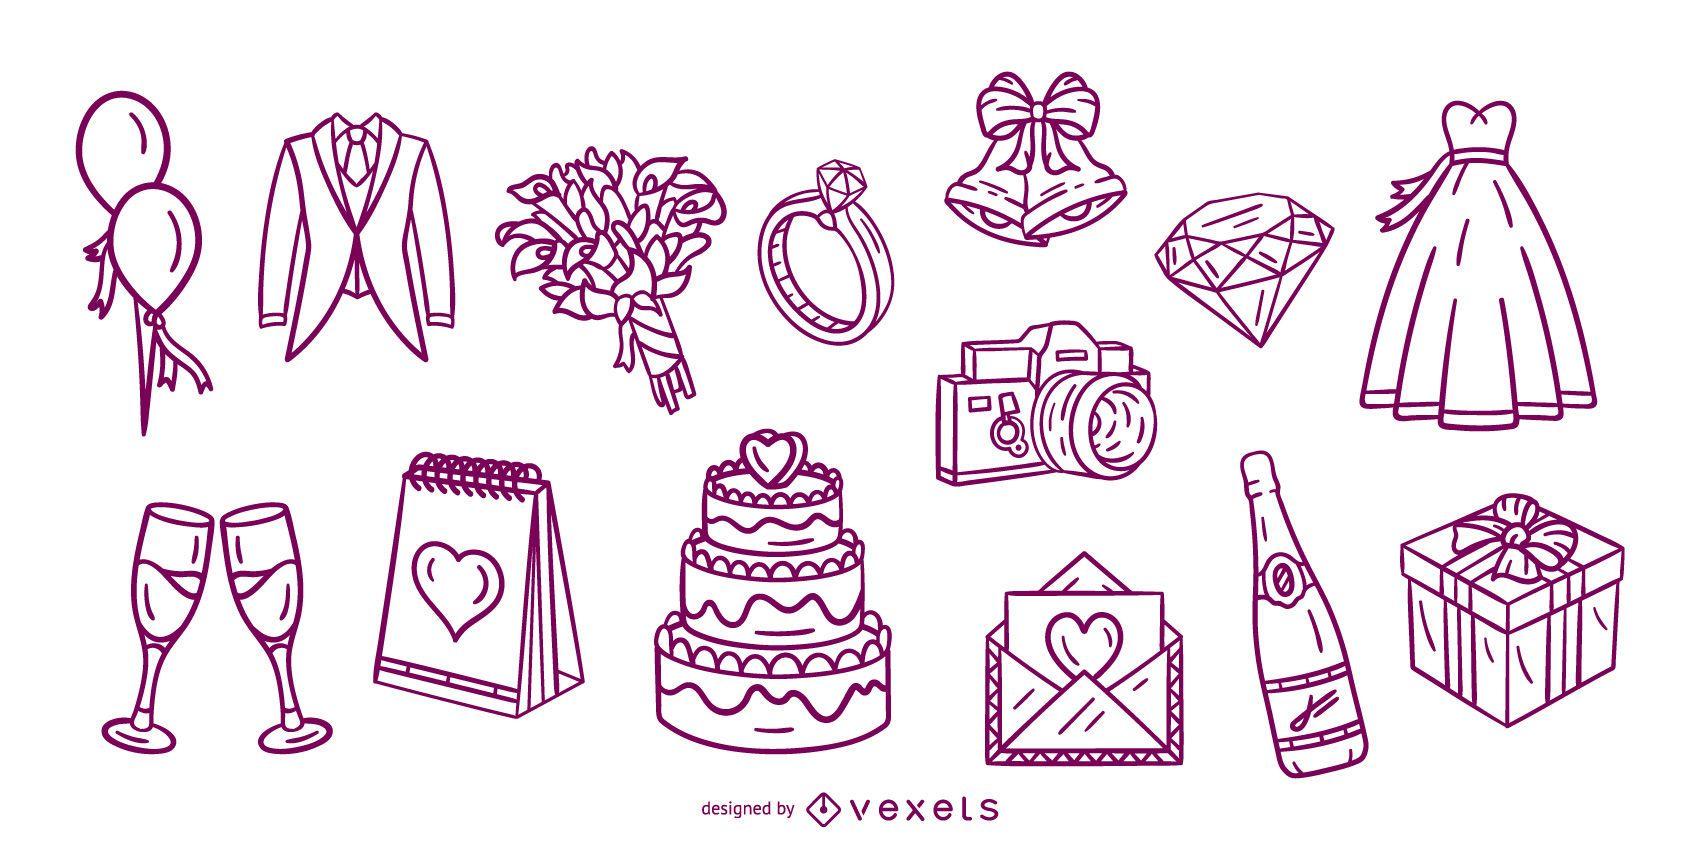 Paquete de elementos de trazo dibujado a mano de boda